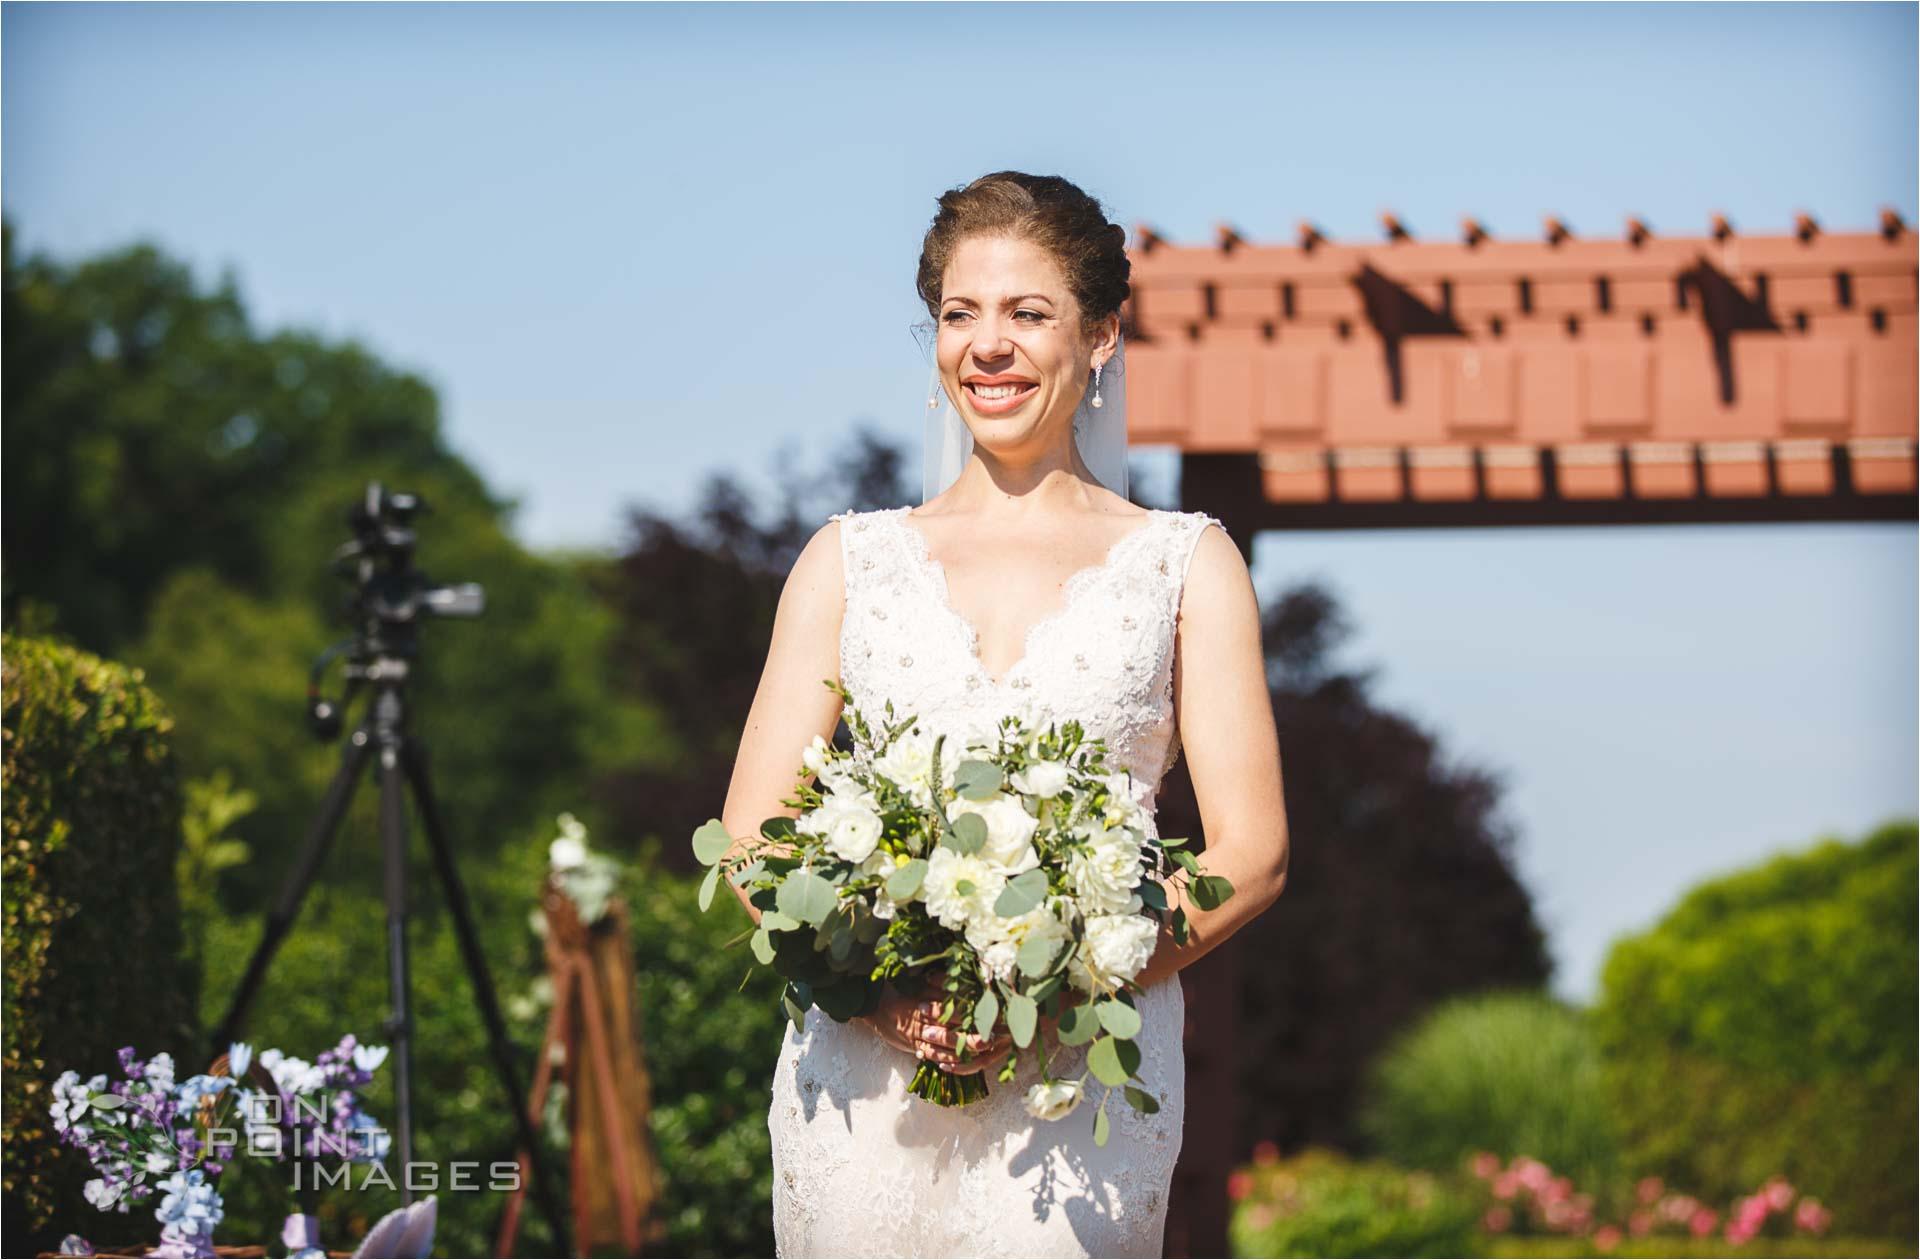 wickham-park-wedding-photographer-ct-19.jpg